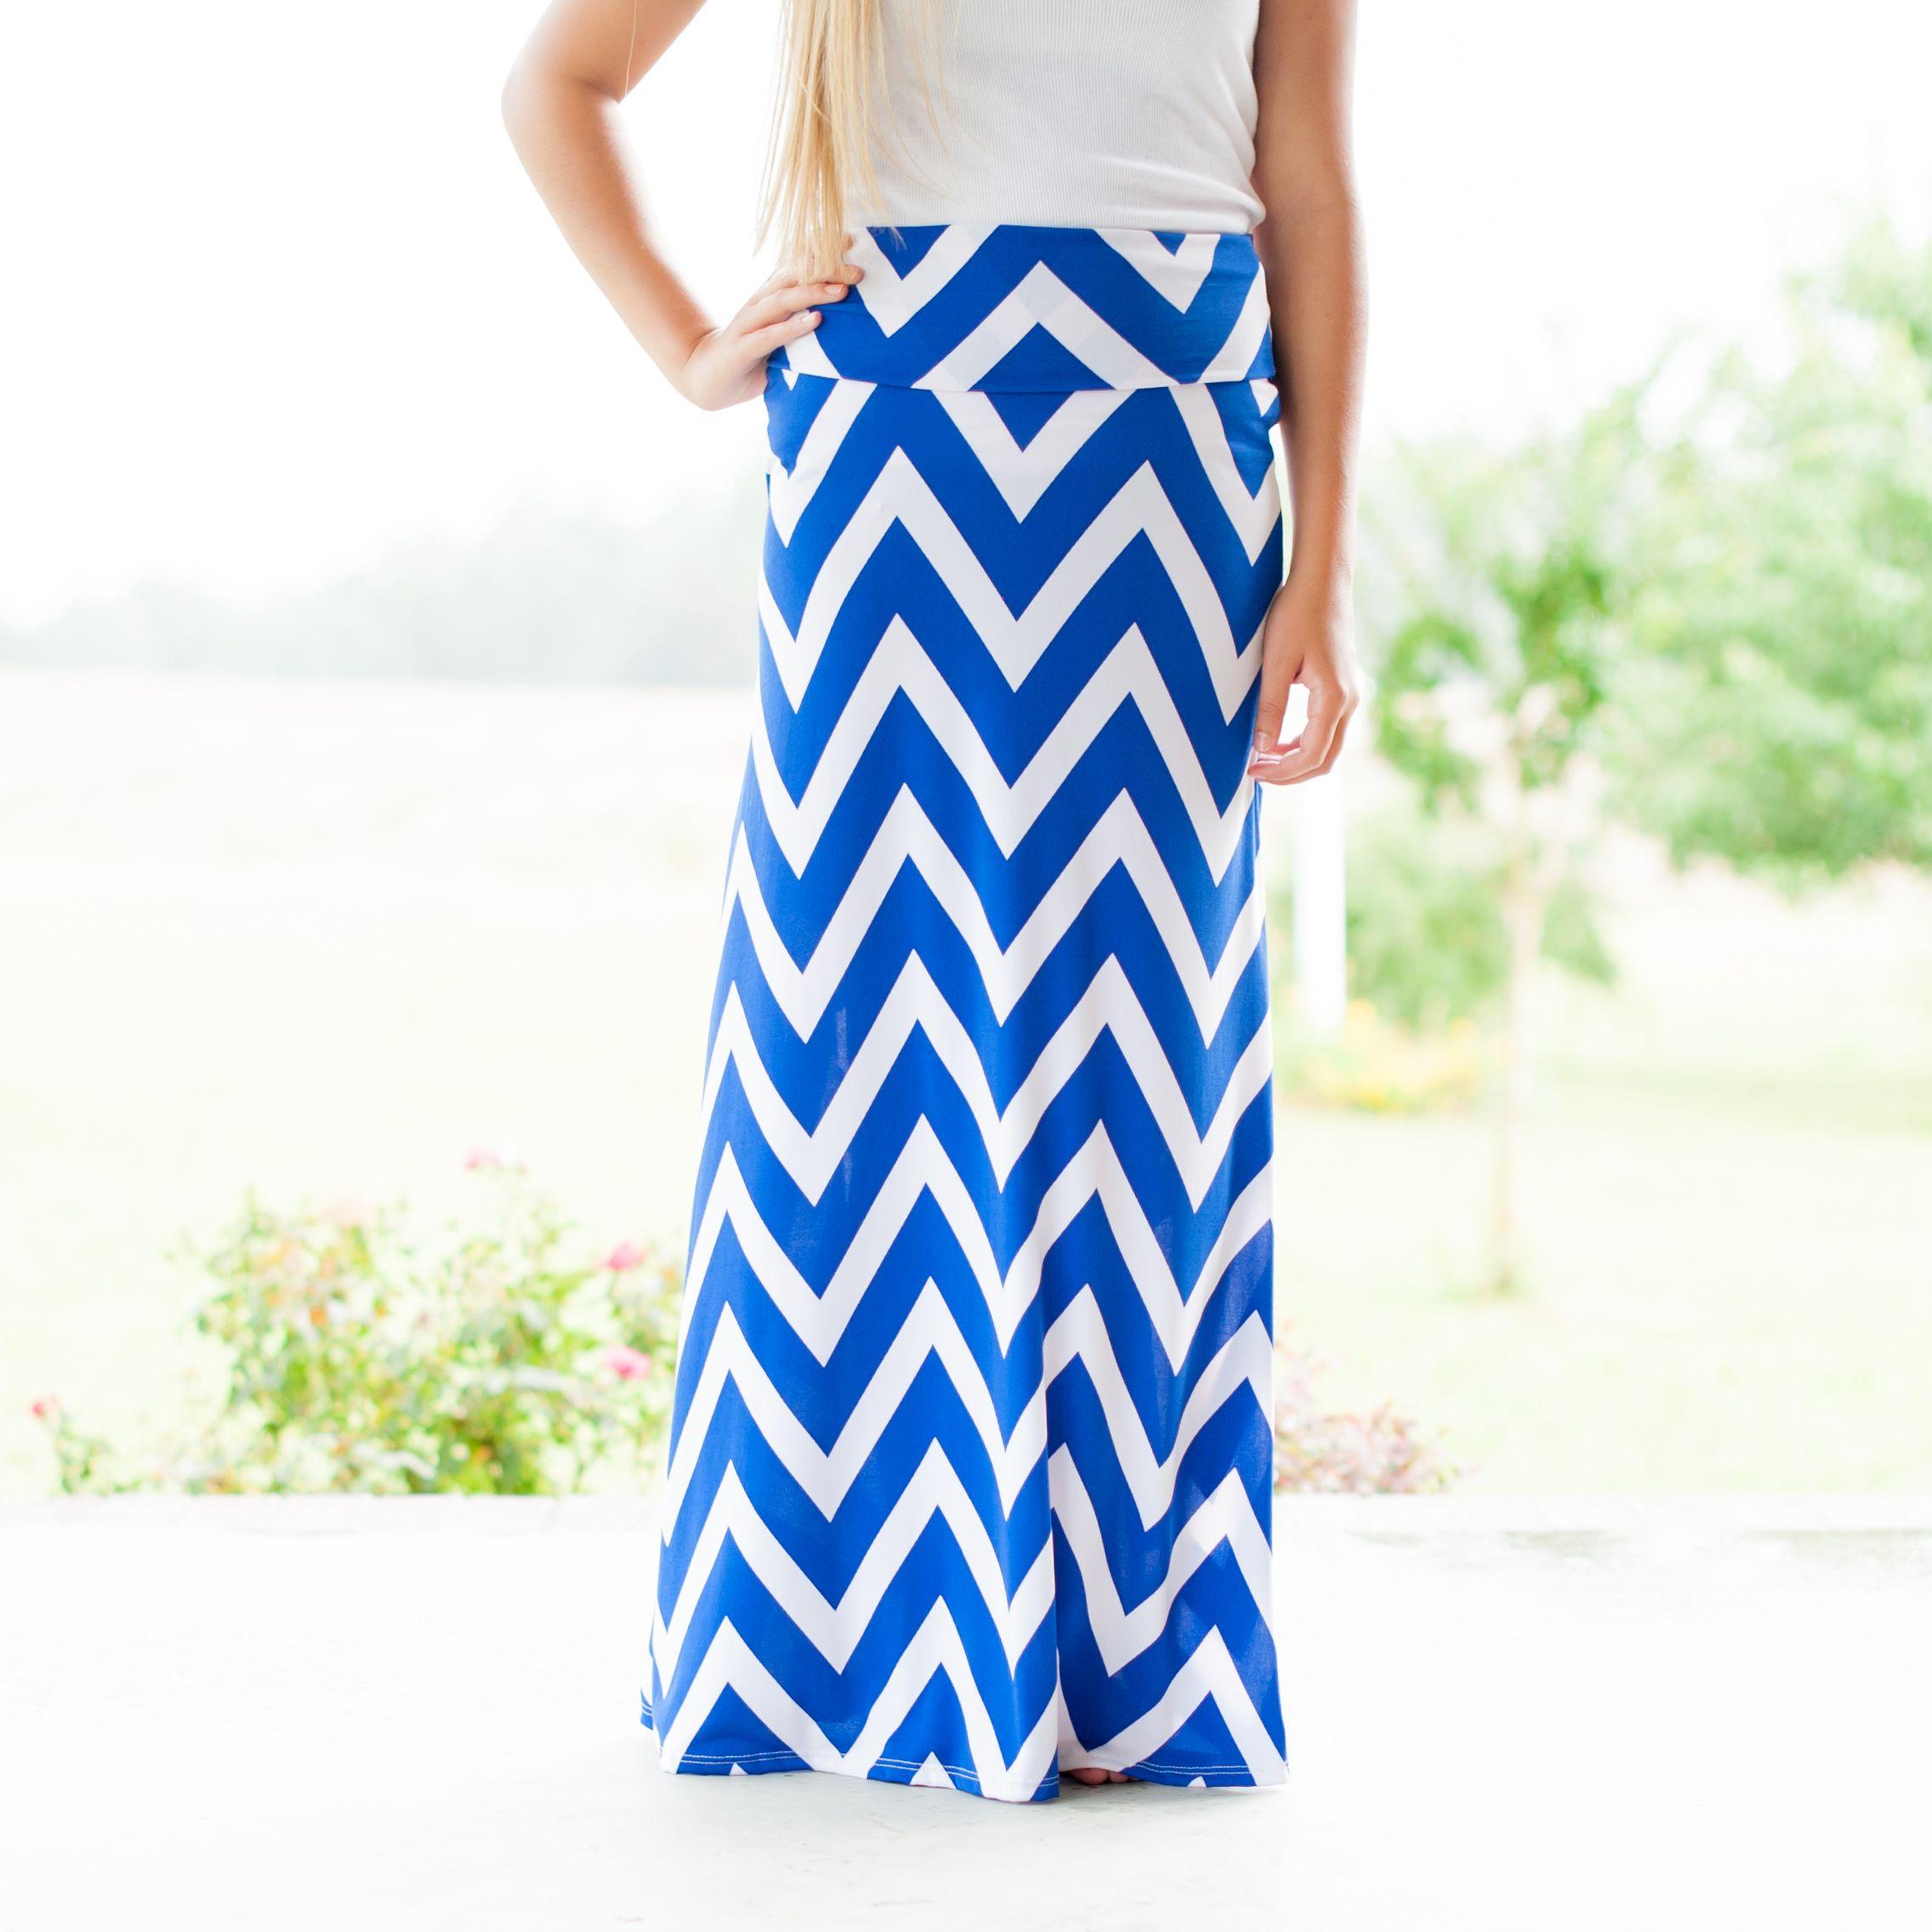 Chevron Print Jersey Maxi Skirt in Royal Blue | Maxi Skirts ...